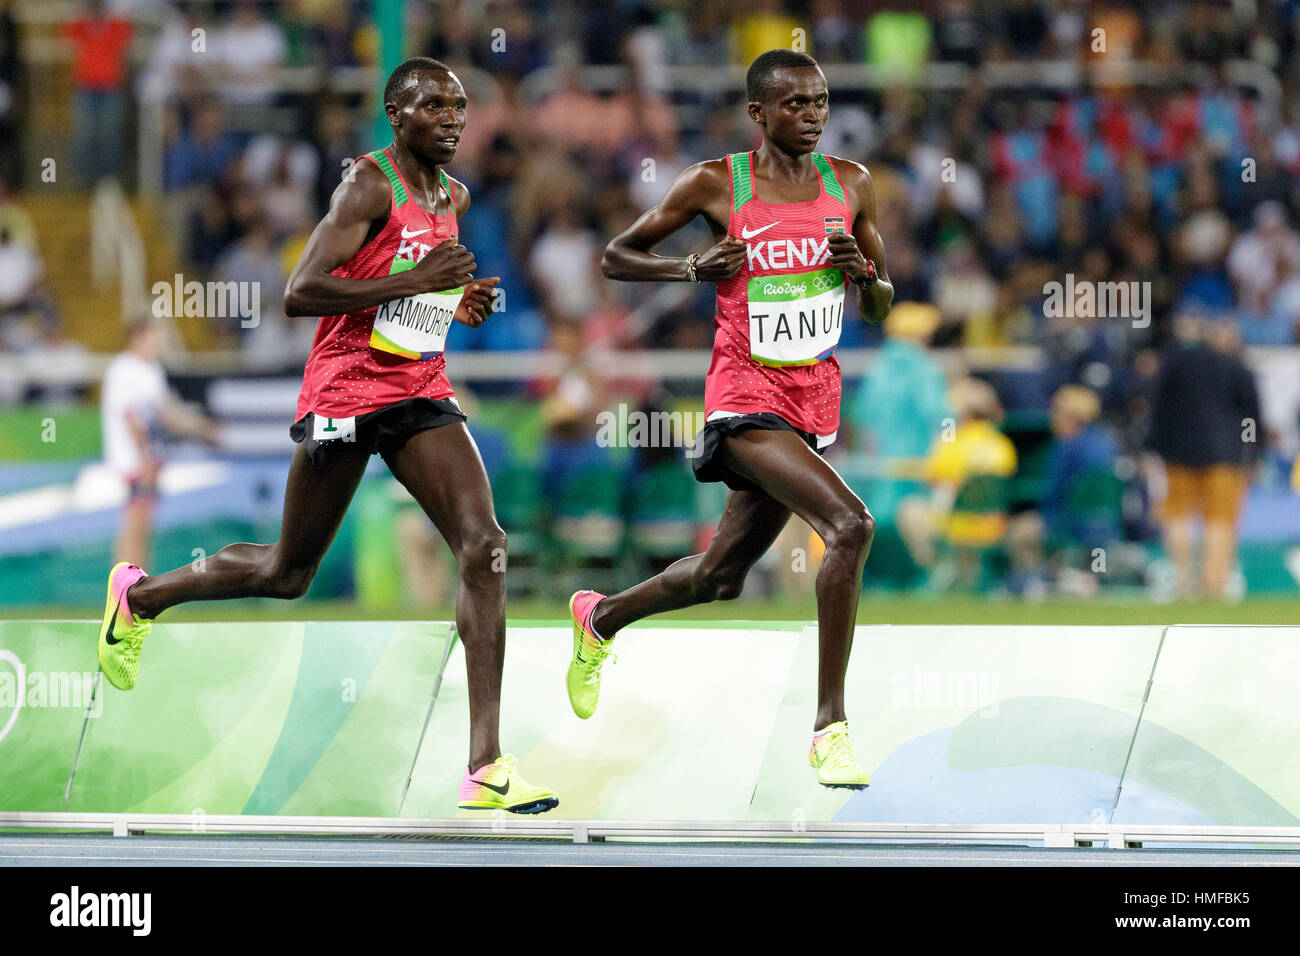 Rio de Janeiro, Brazil. 13 August 2016.  Athletics, Geoffrey Kipsang Kamworor (KEN) and Paul Kipngetich Tanui (KEN) Stock Photo